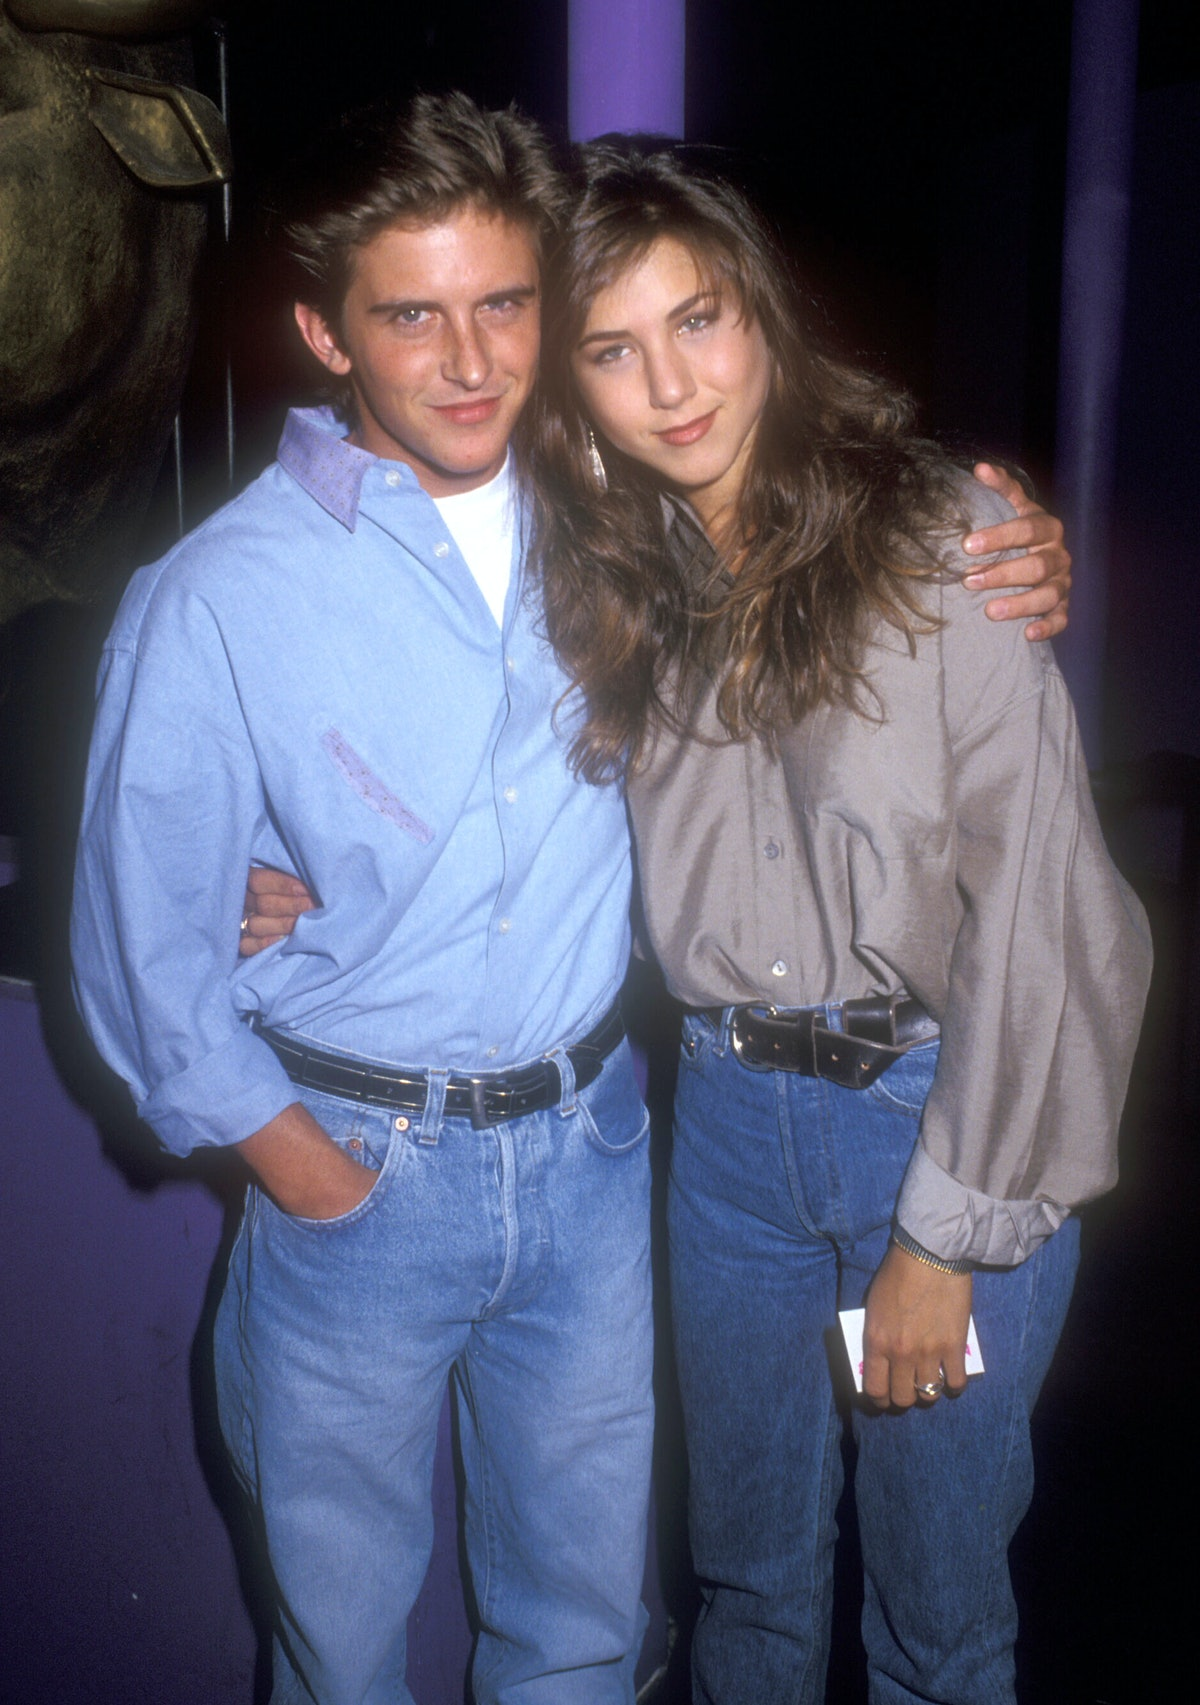 Charlie Schlatter and Jennifer Aniston dated.